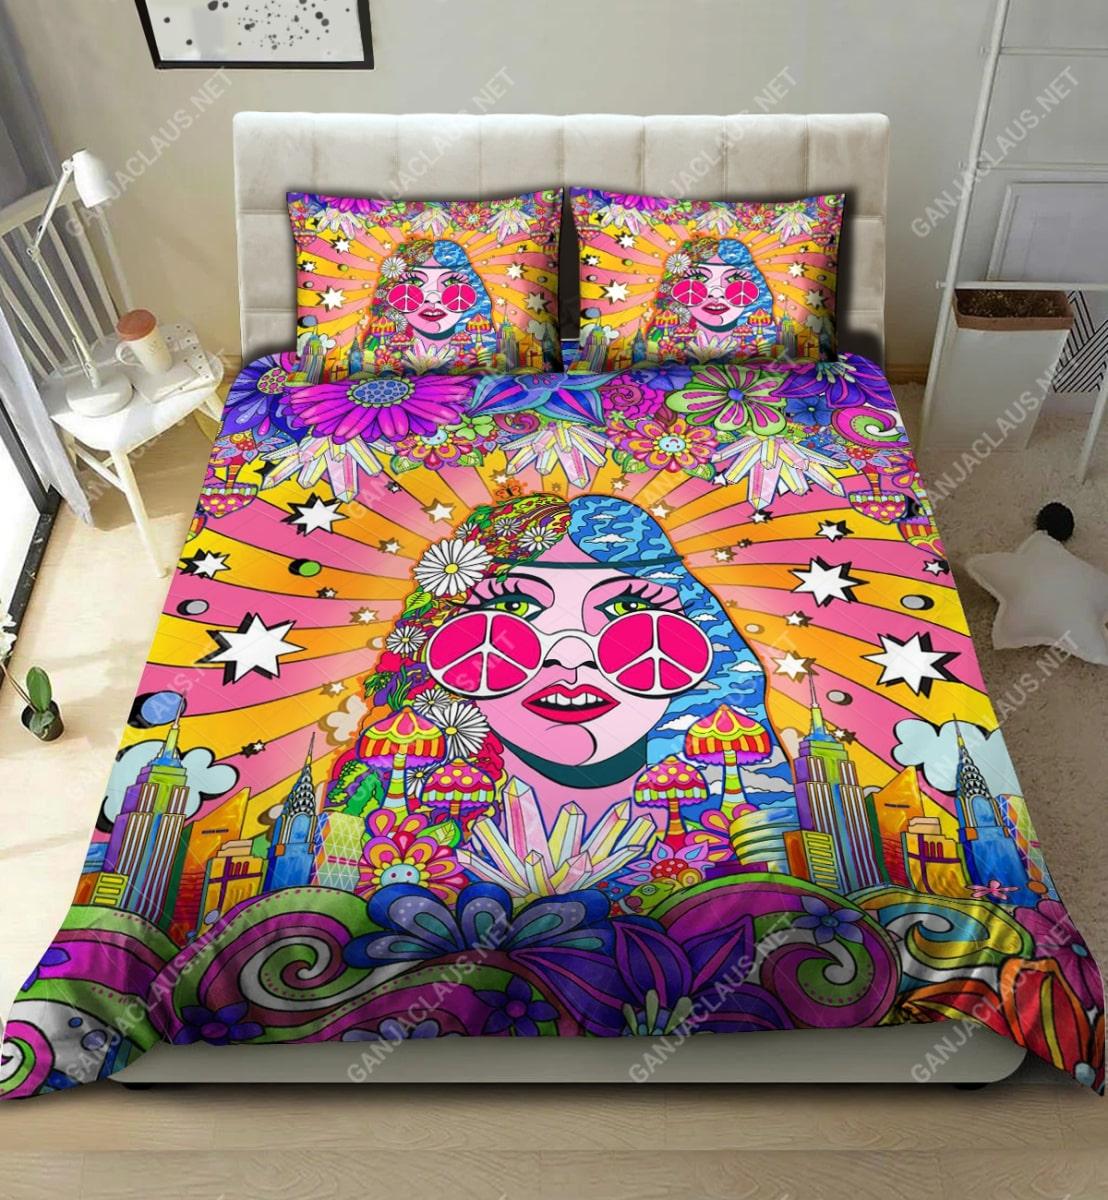 hippie girl colorful full printing bedding set 2